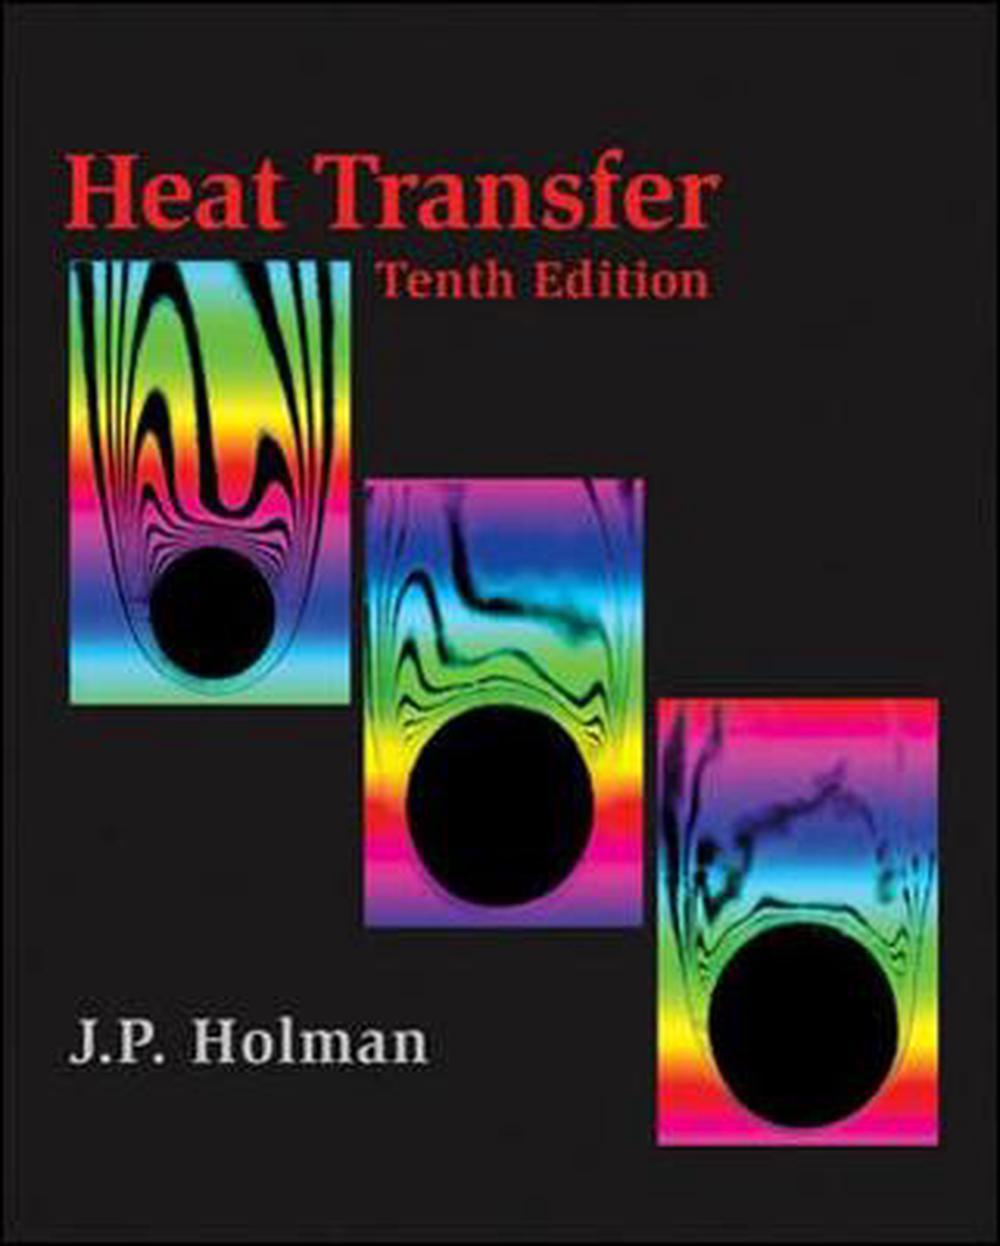 دانلود حل المسائل انتقال حرارت هولمن ویرایش دهم